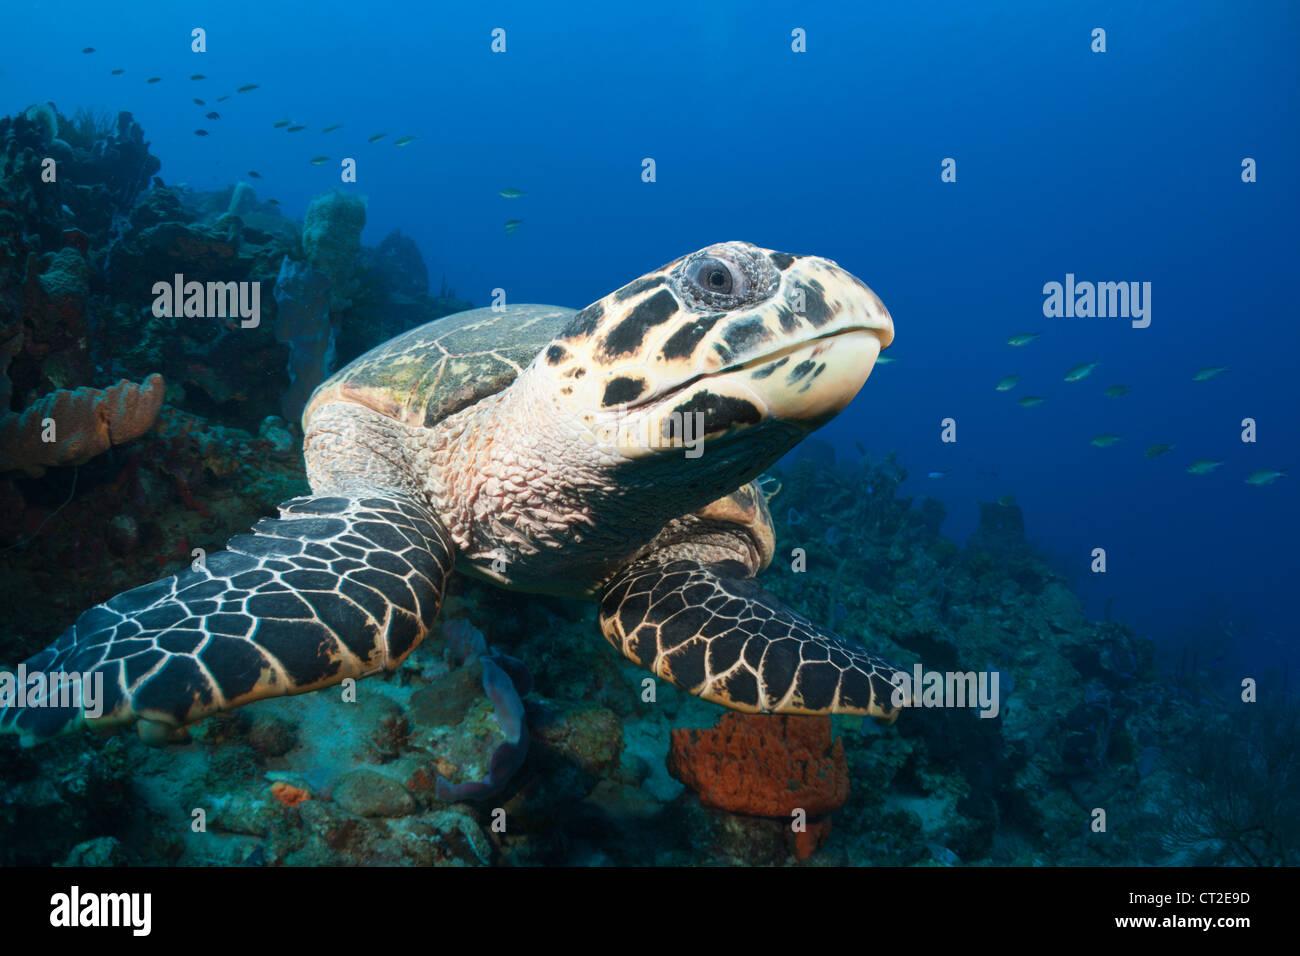 Tartaruga embricata, Eretmochelys imbriocota, Mar dei Caraibi, Dominica Immagini Stock